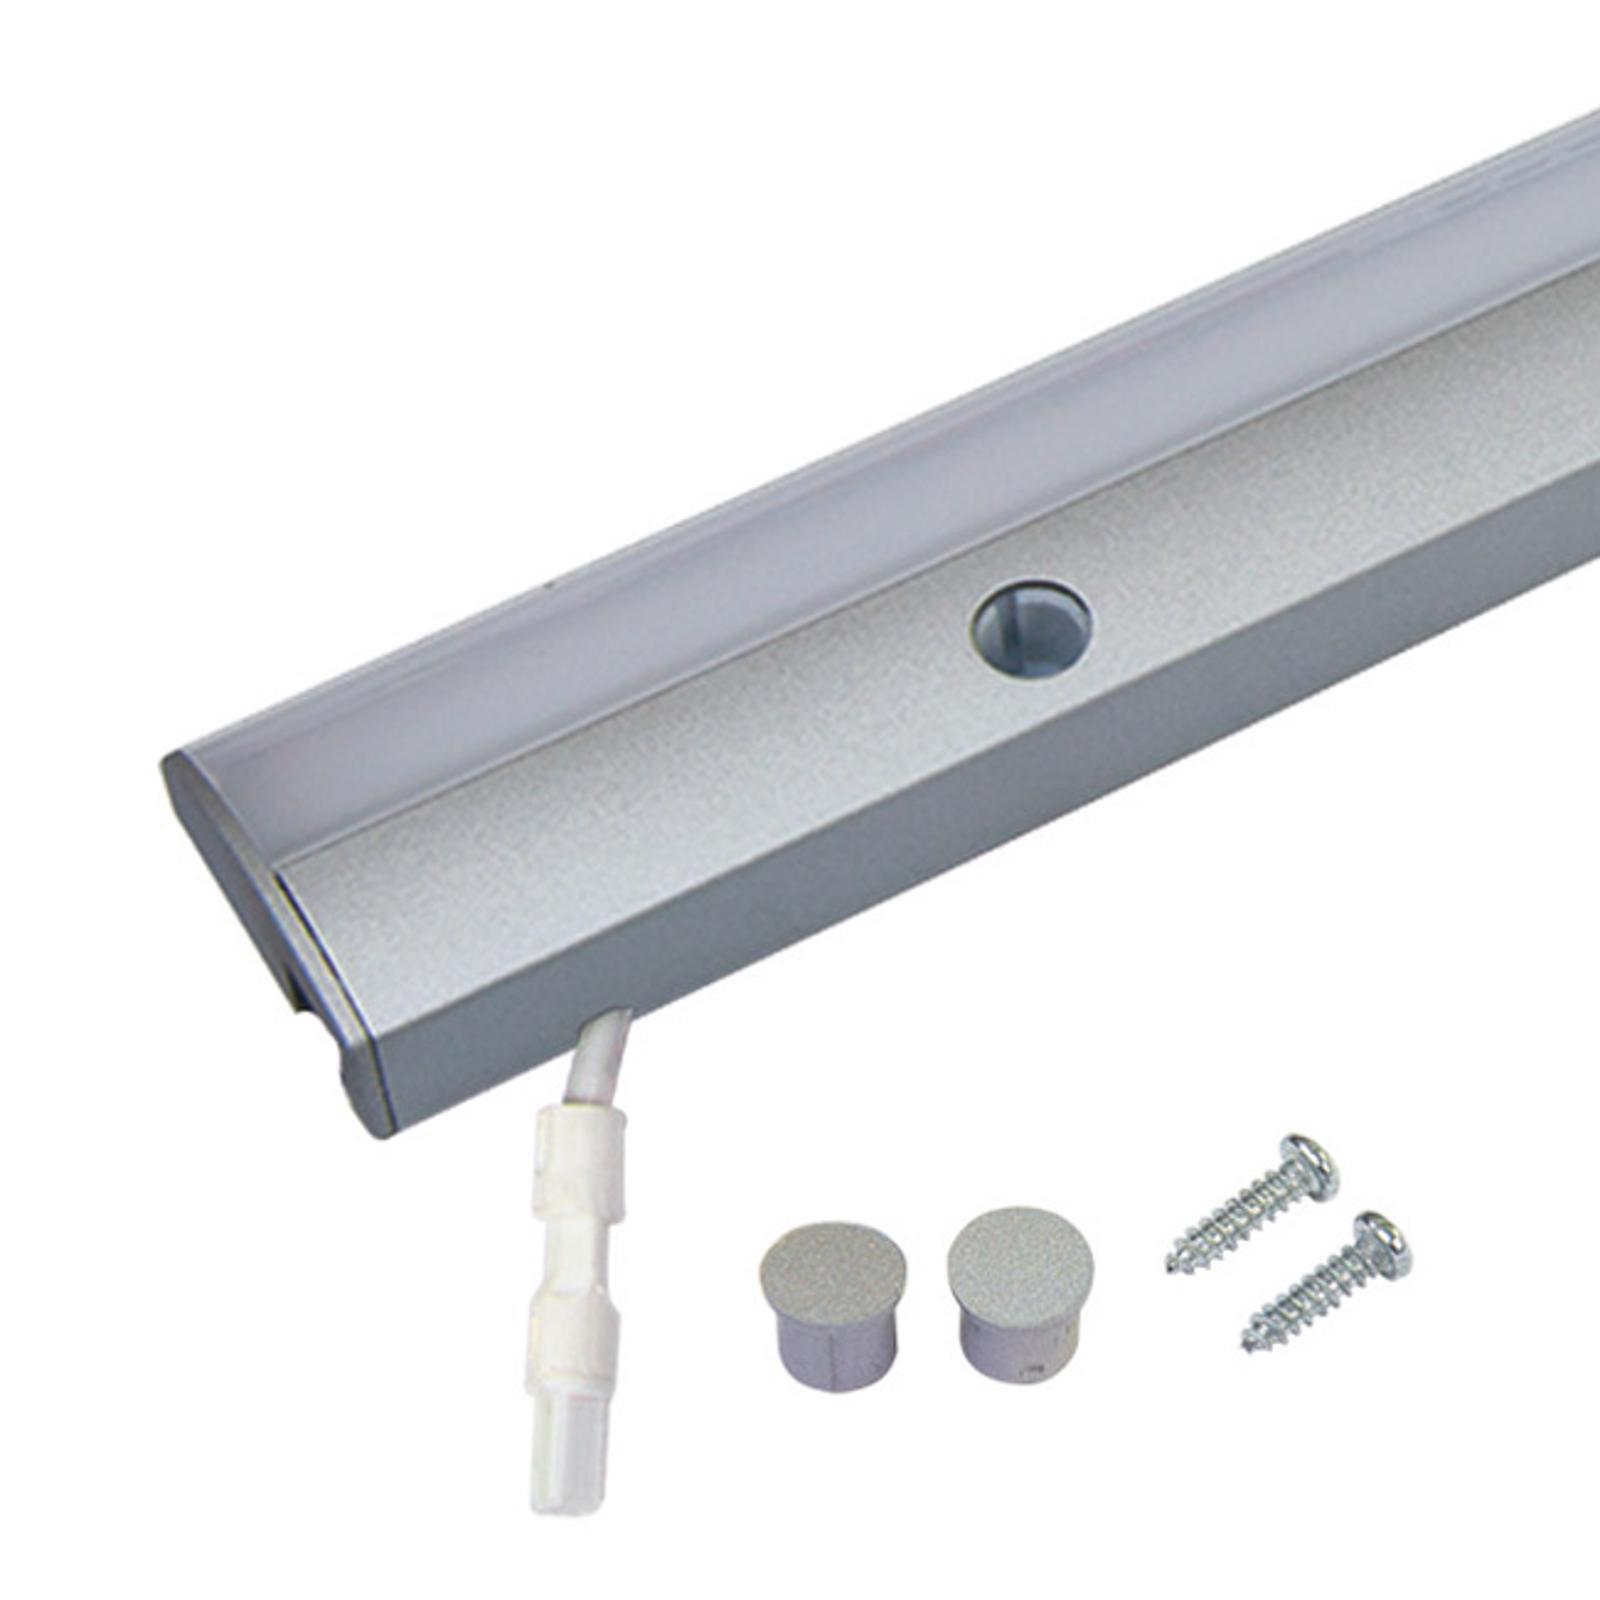 LED sous meuble Dynamic ModuLite F, alu, 60cm